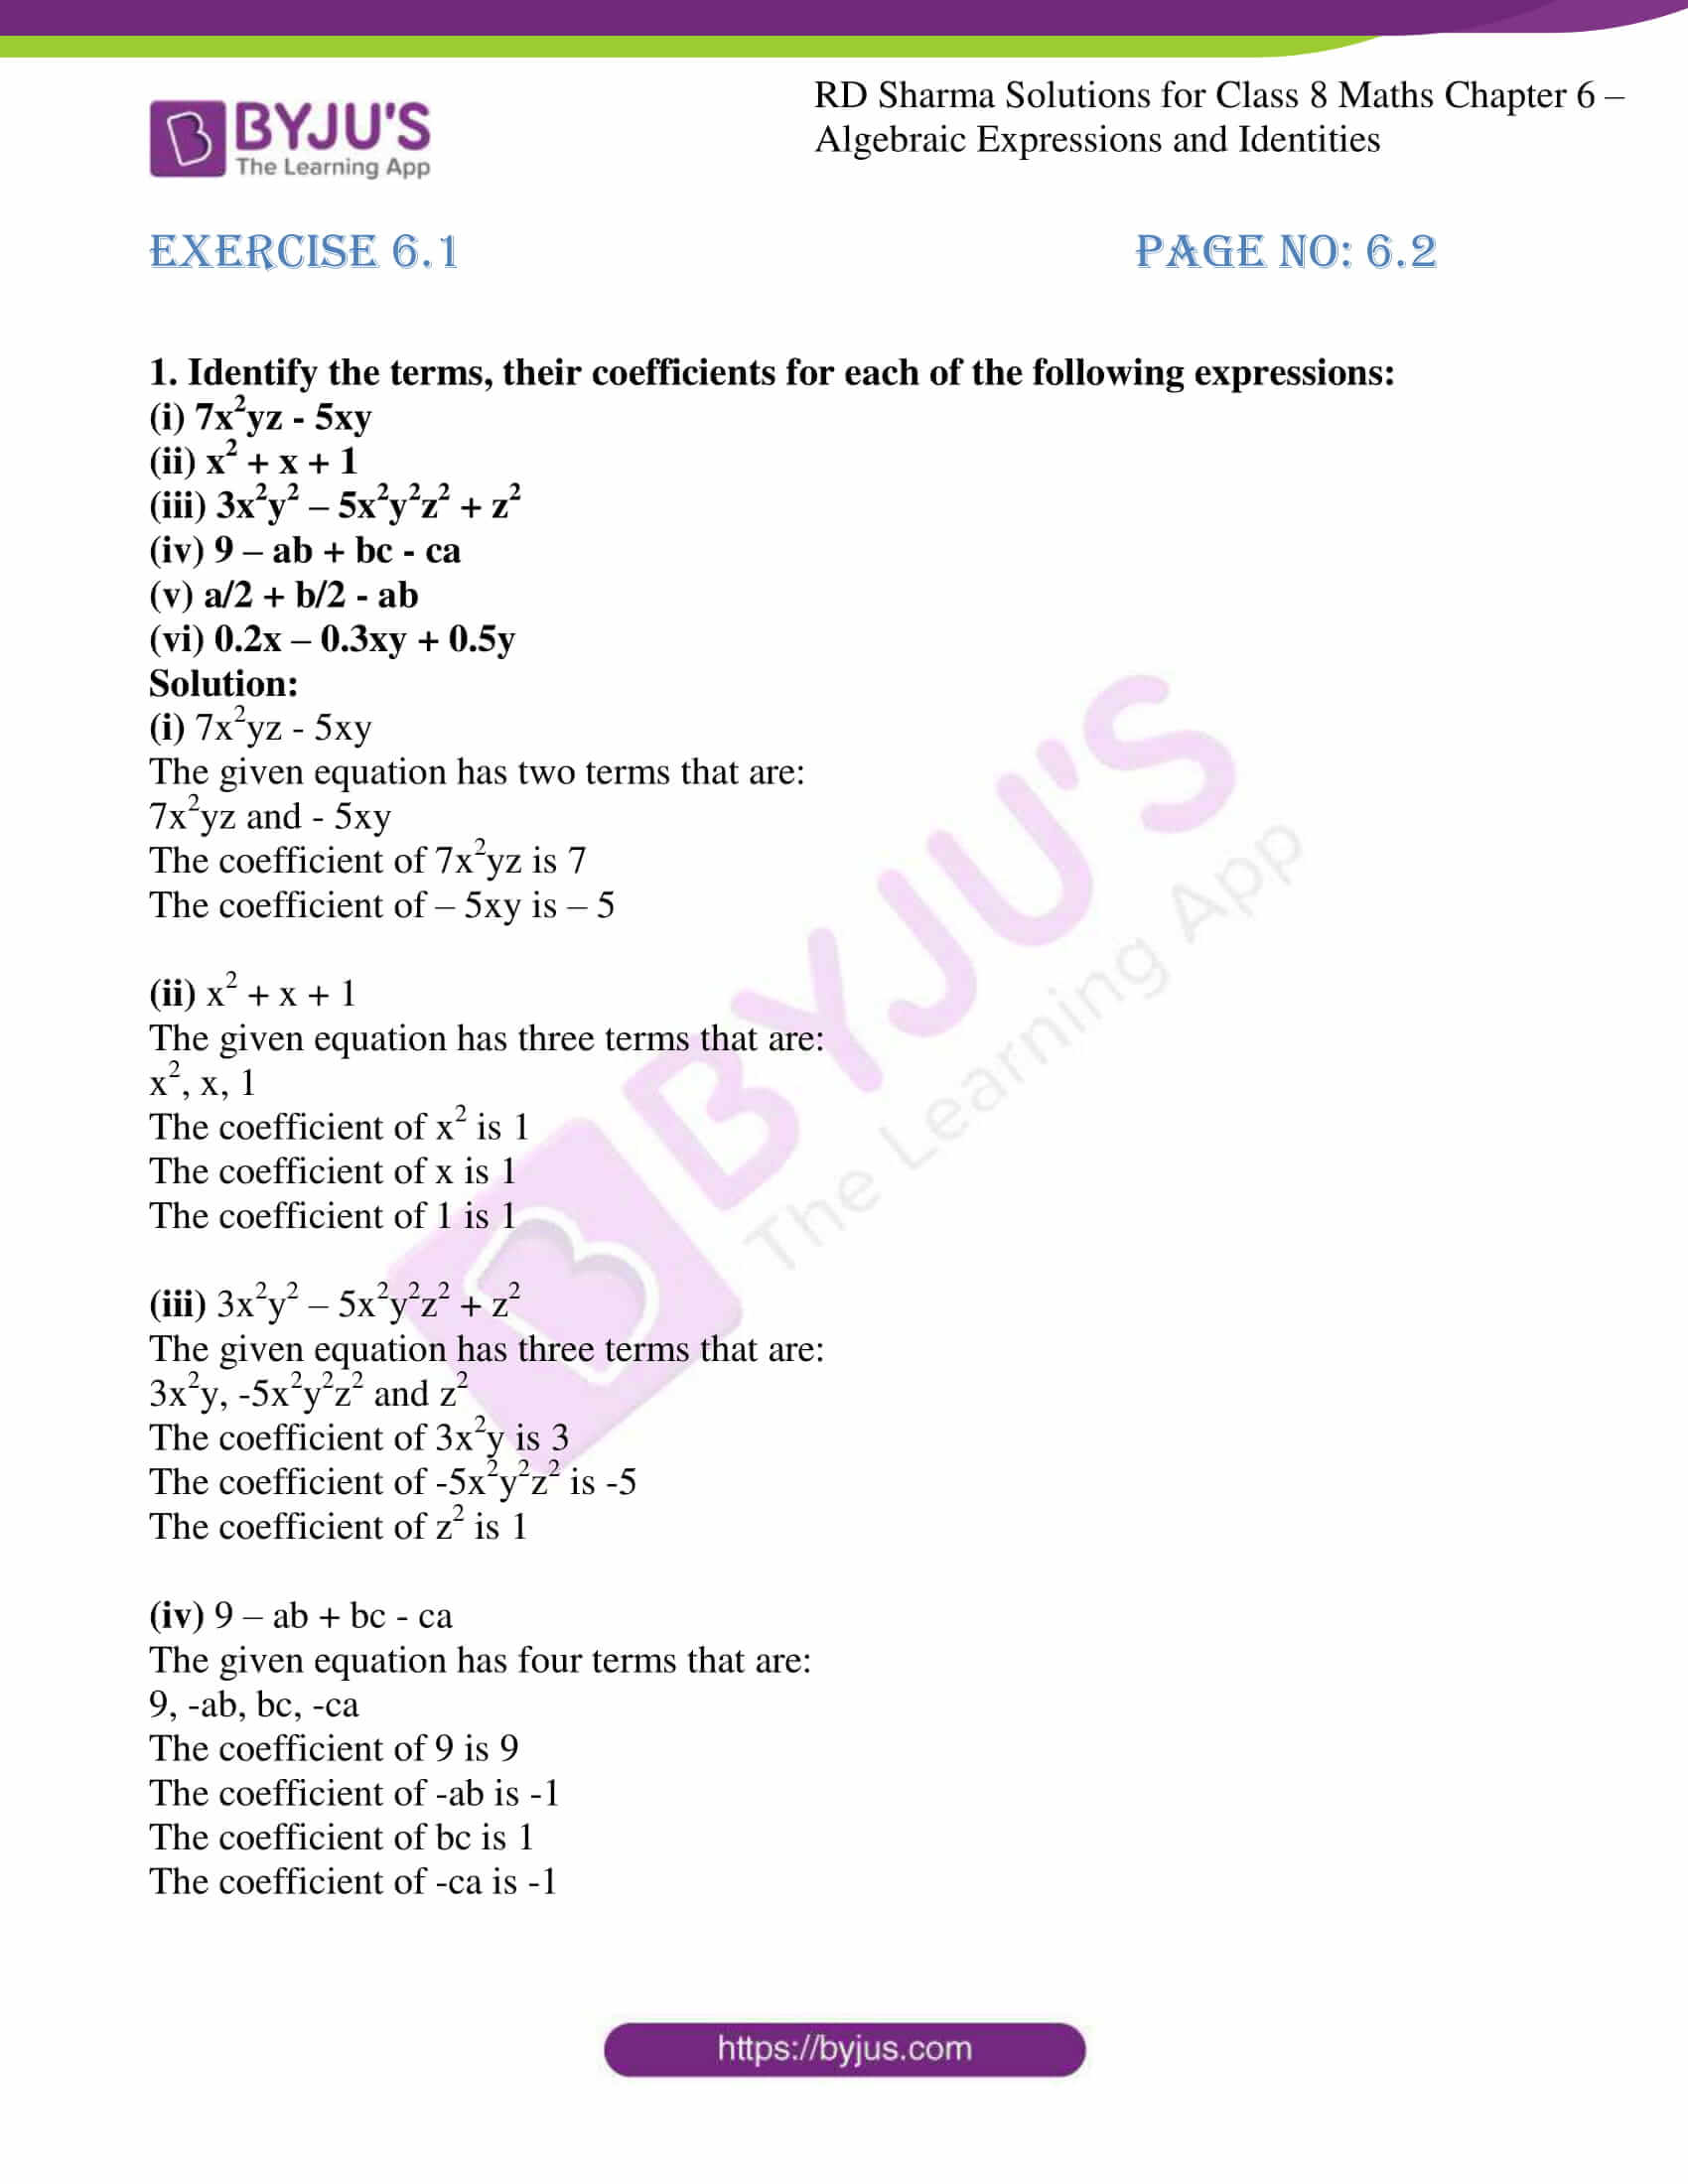 rd sharma class 8 maths chapter 6 exercise 1 1